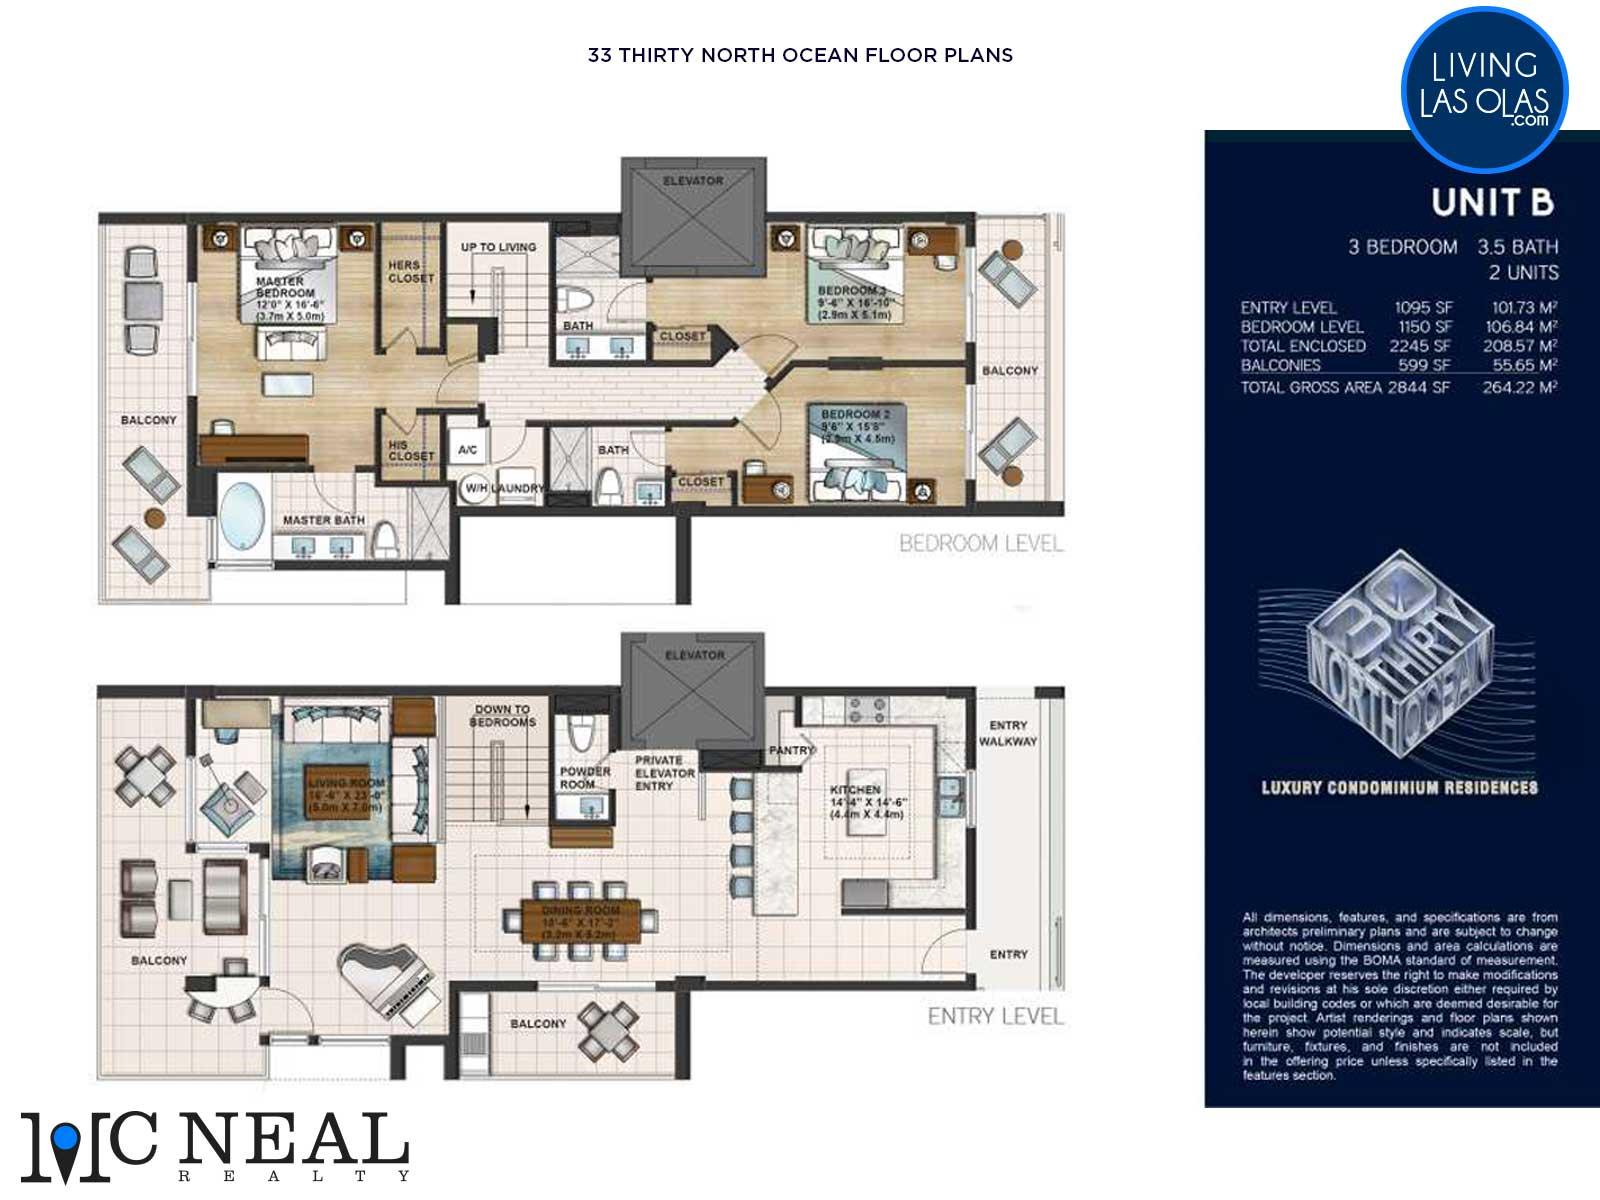 30 Thirty North Ocean Condos Floor Plan B